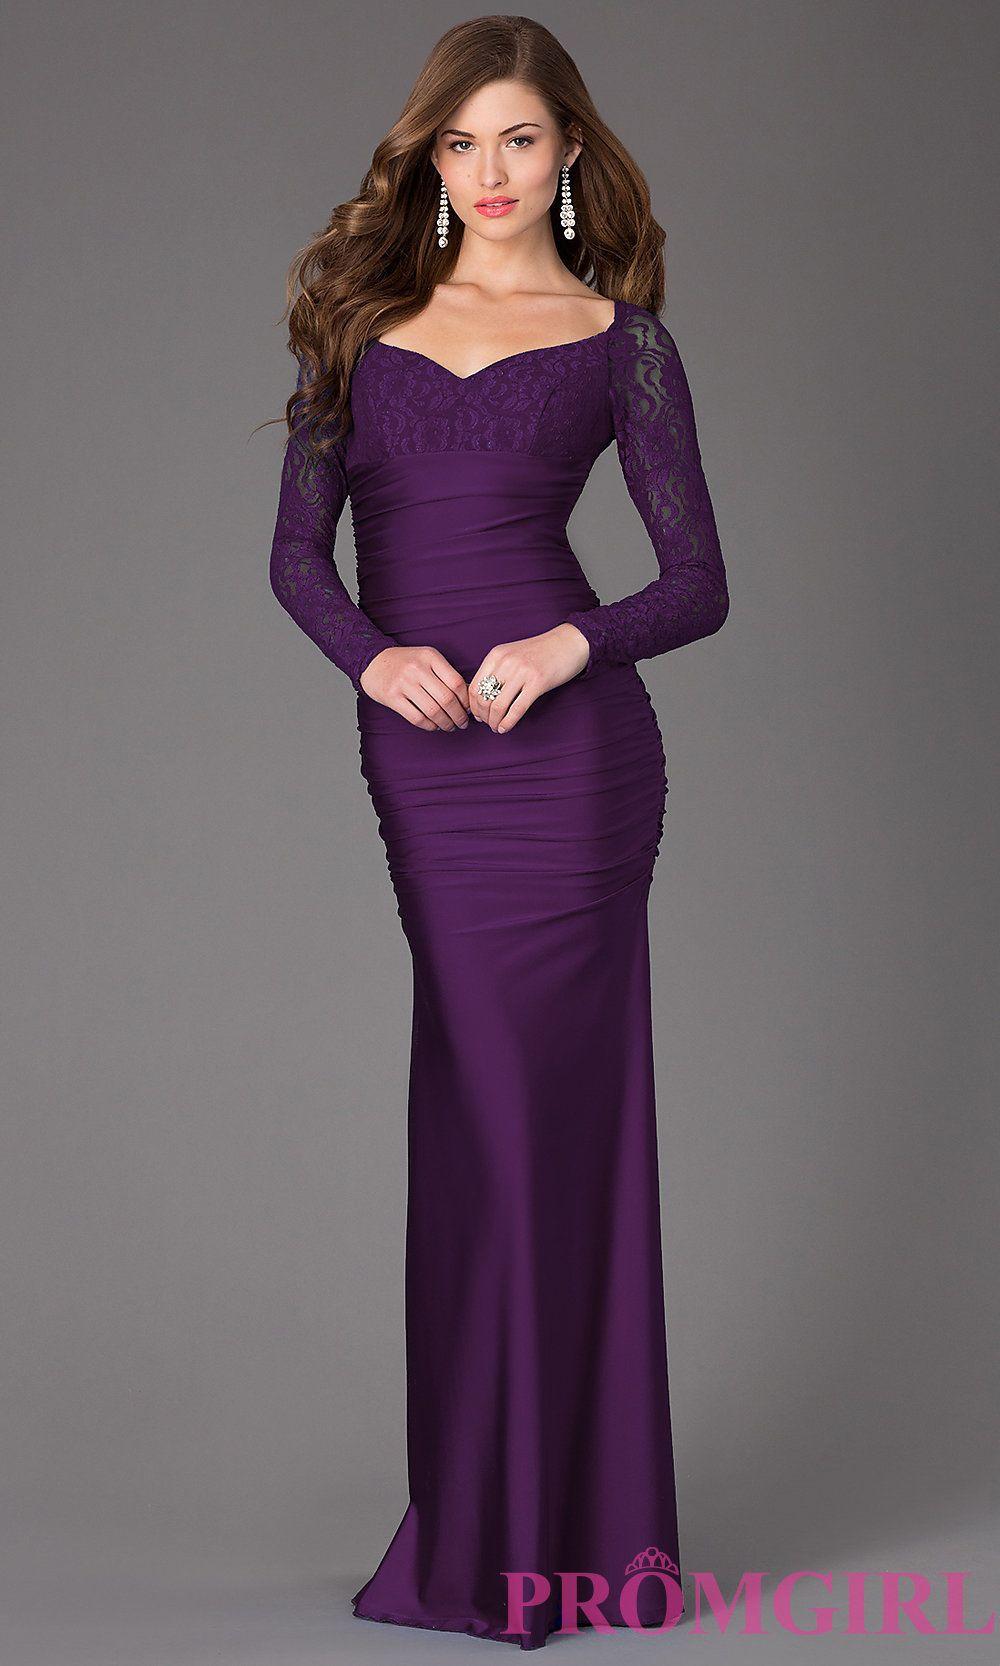 Long Prom Dress Detail Image 3 | grad gowns | Pinterest